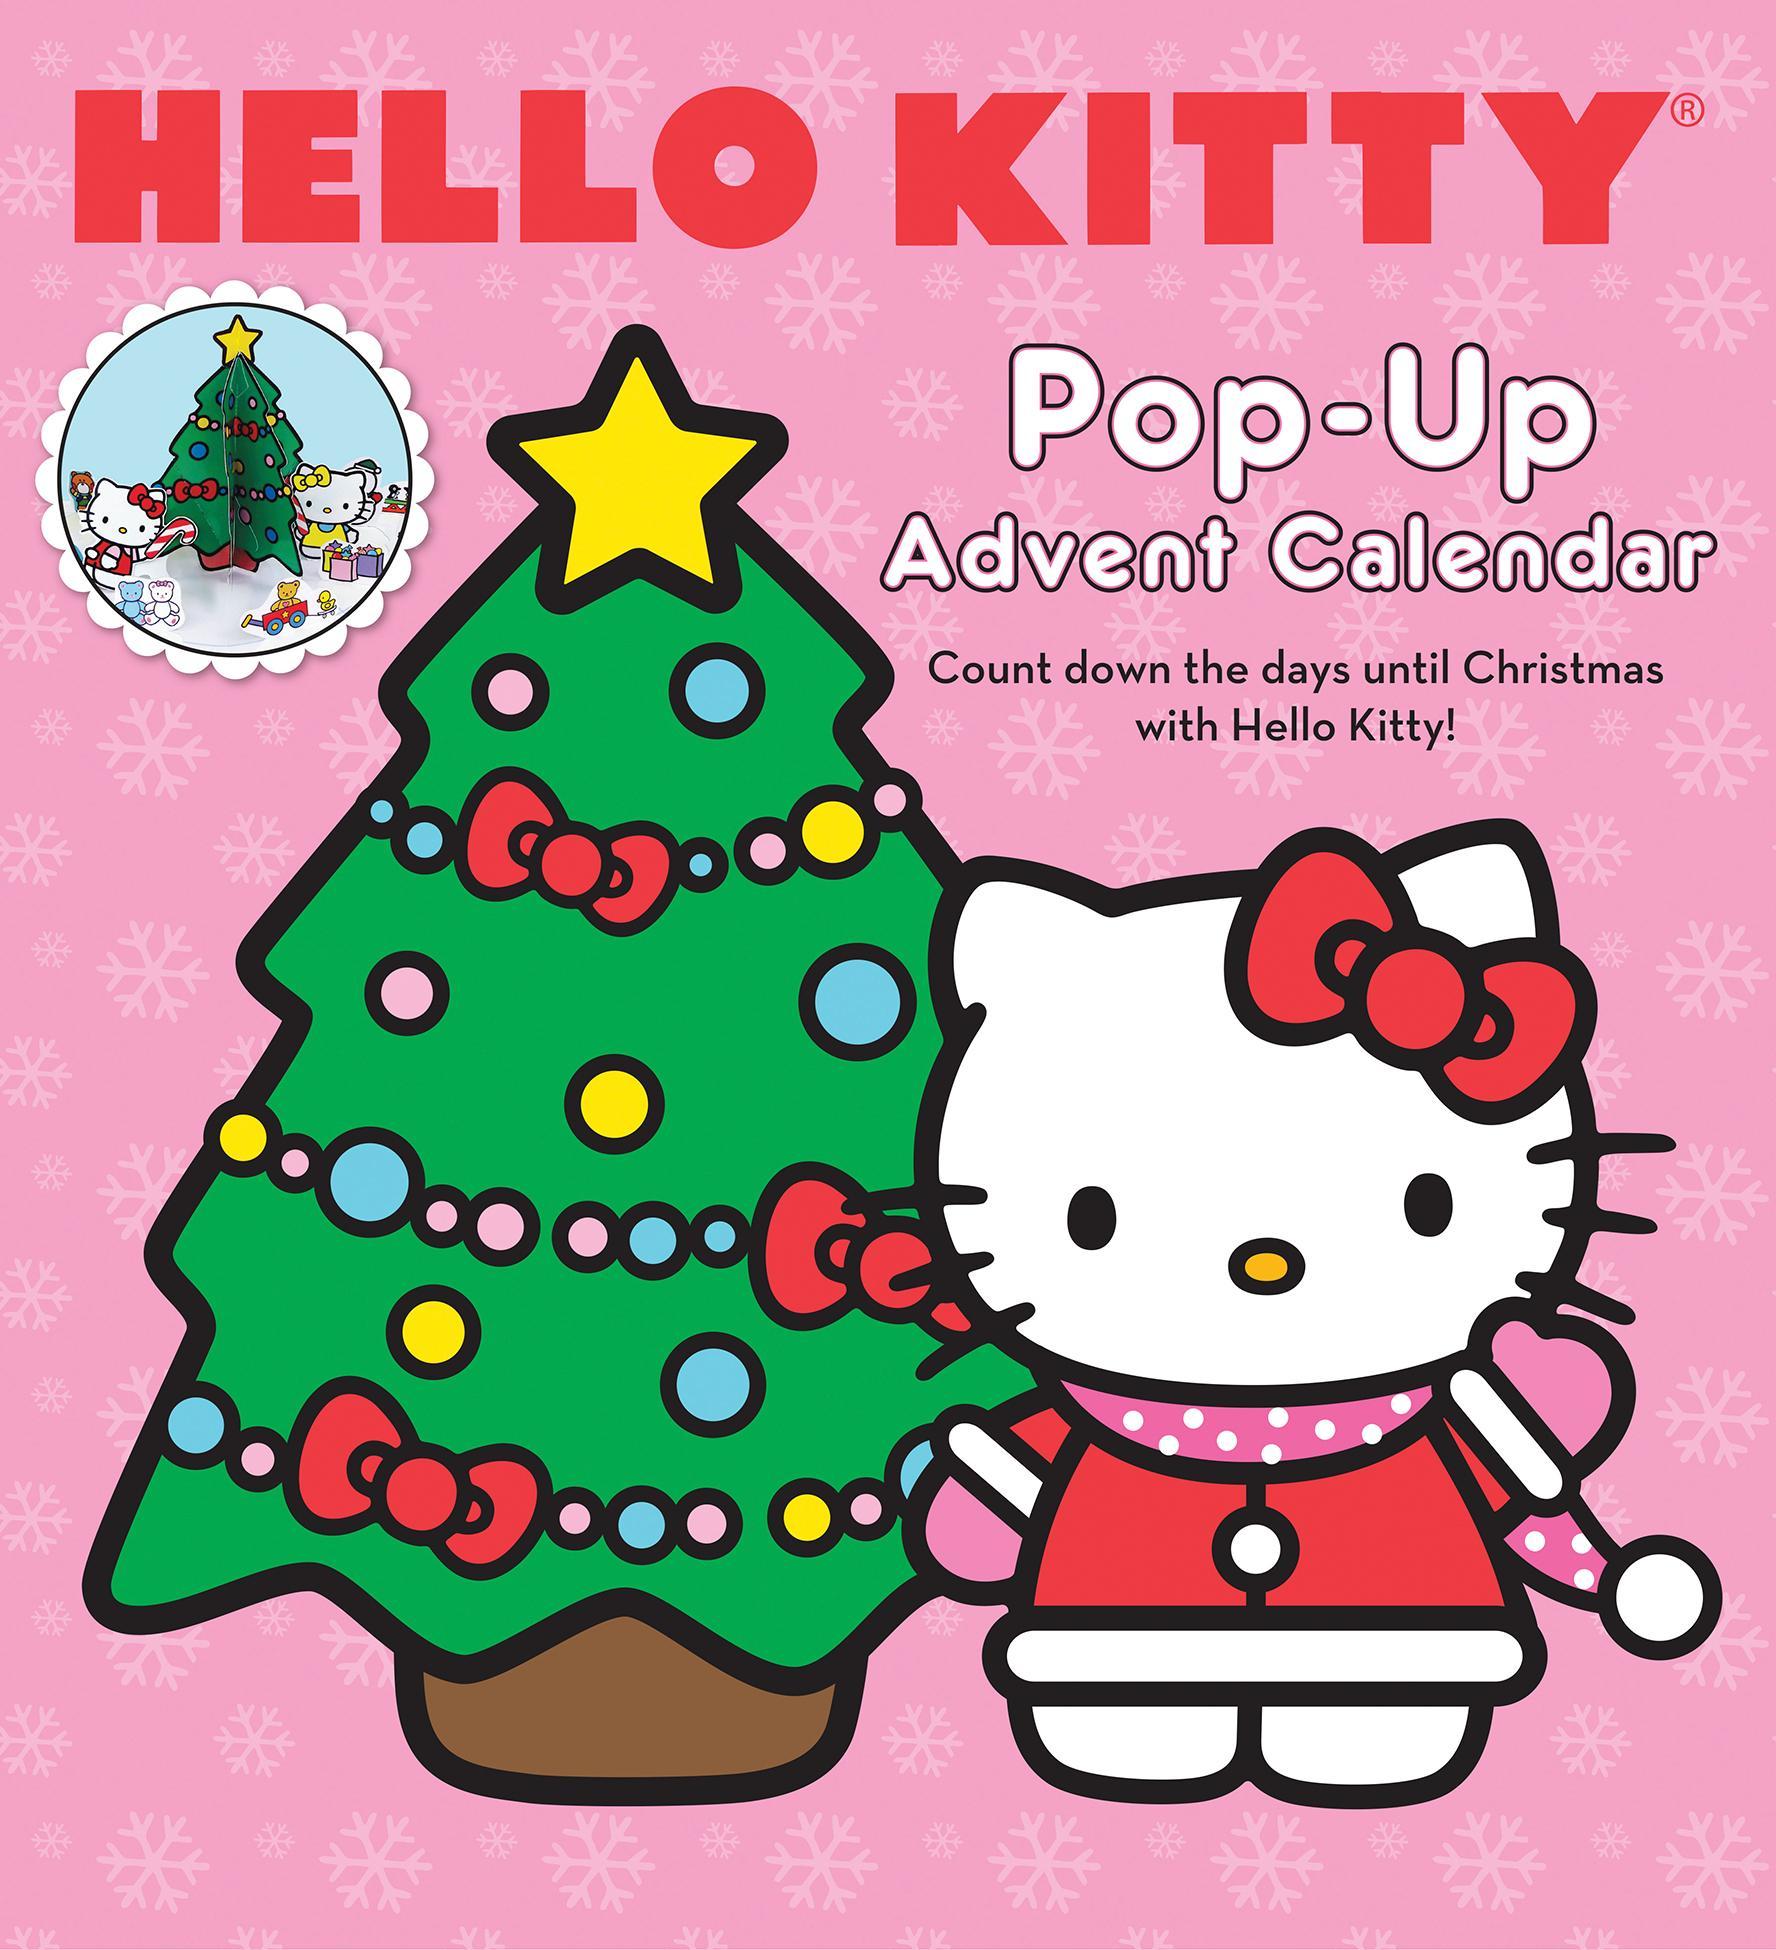 Hello Kitty Pop-Up Advent Calendar (Other)